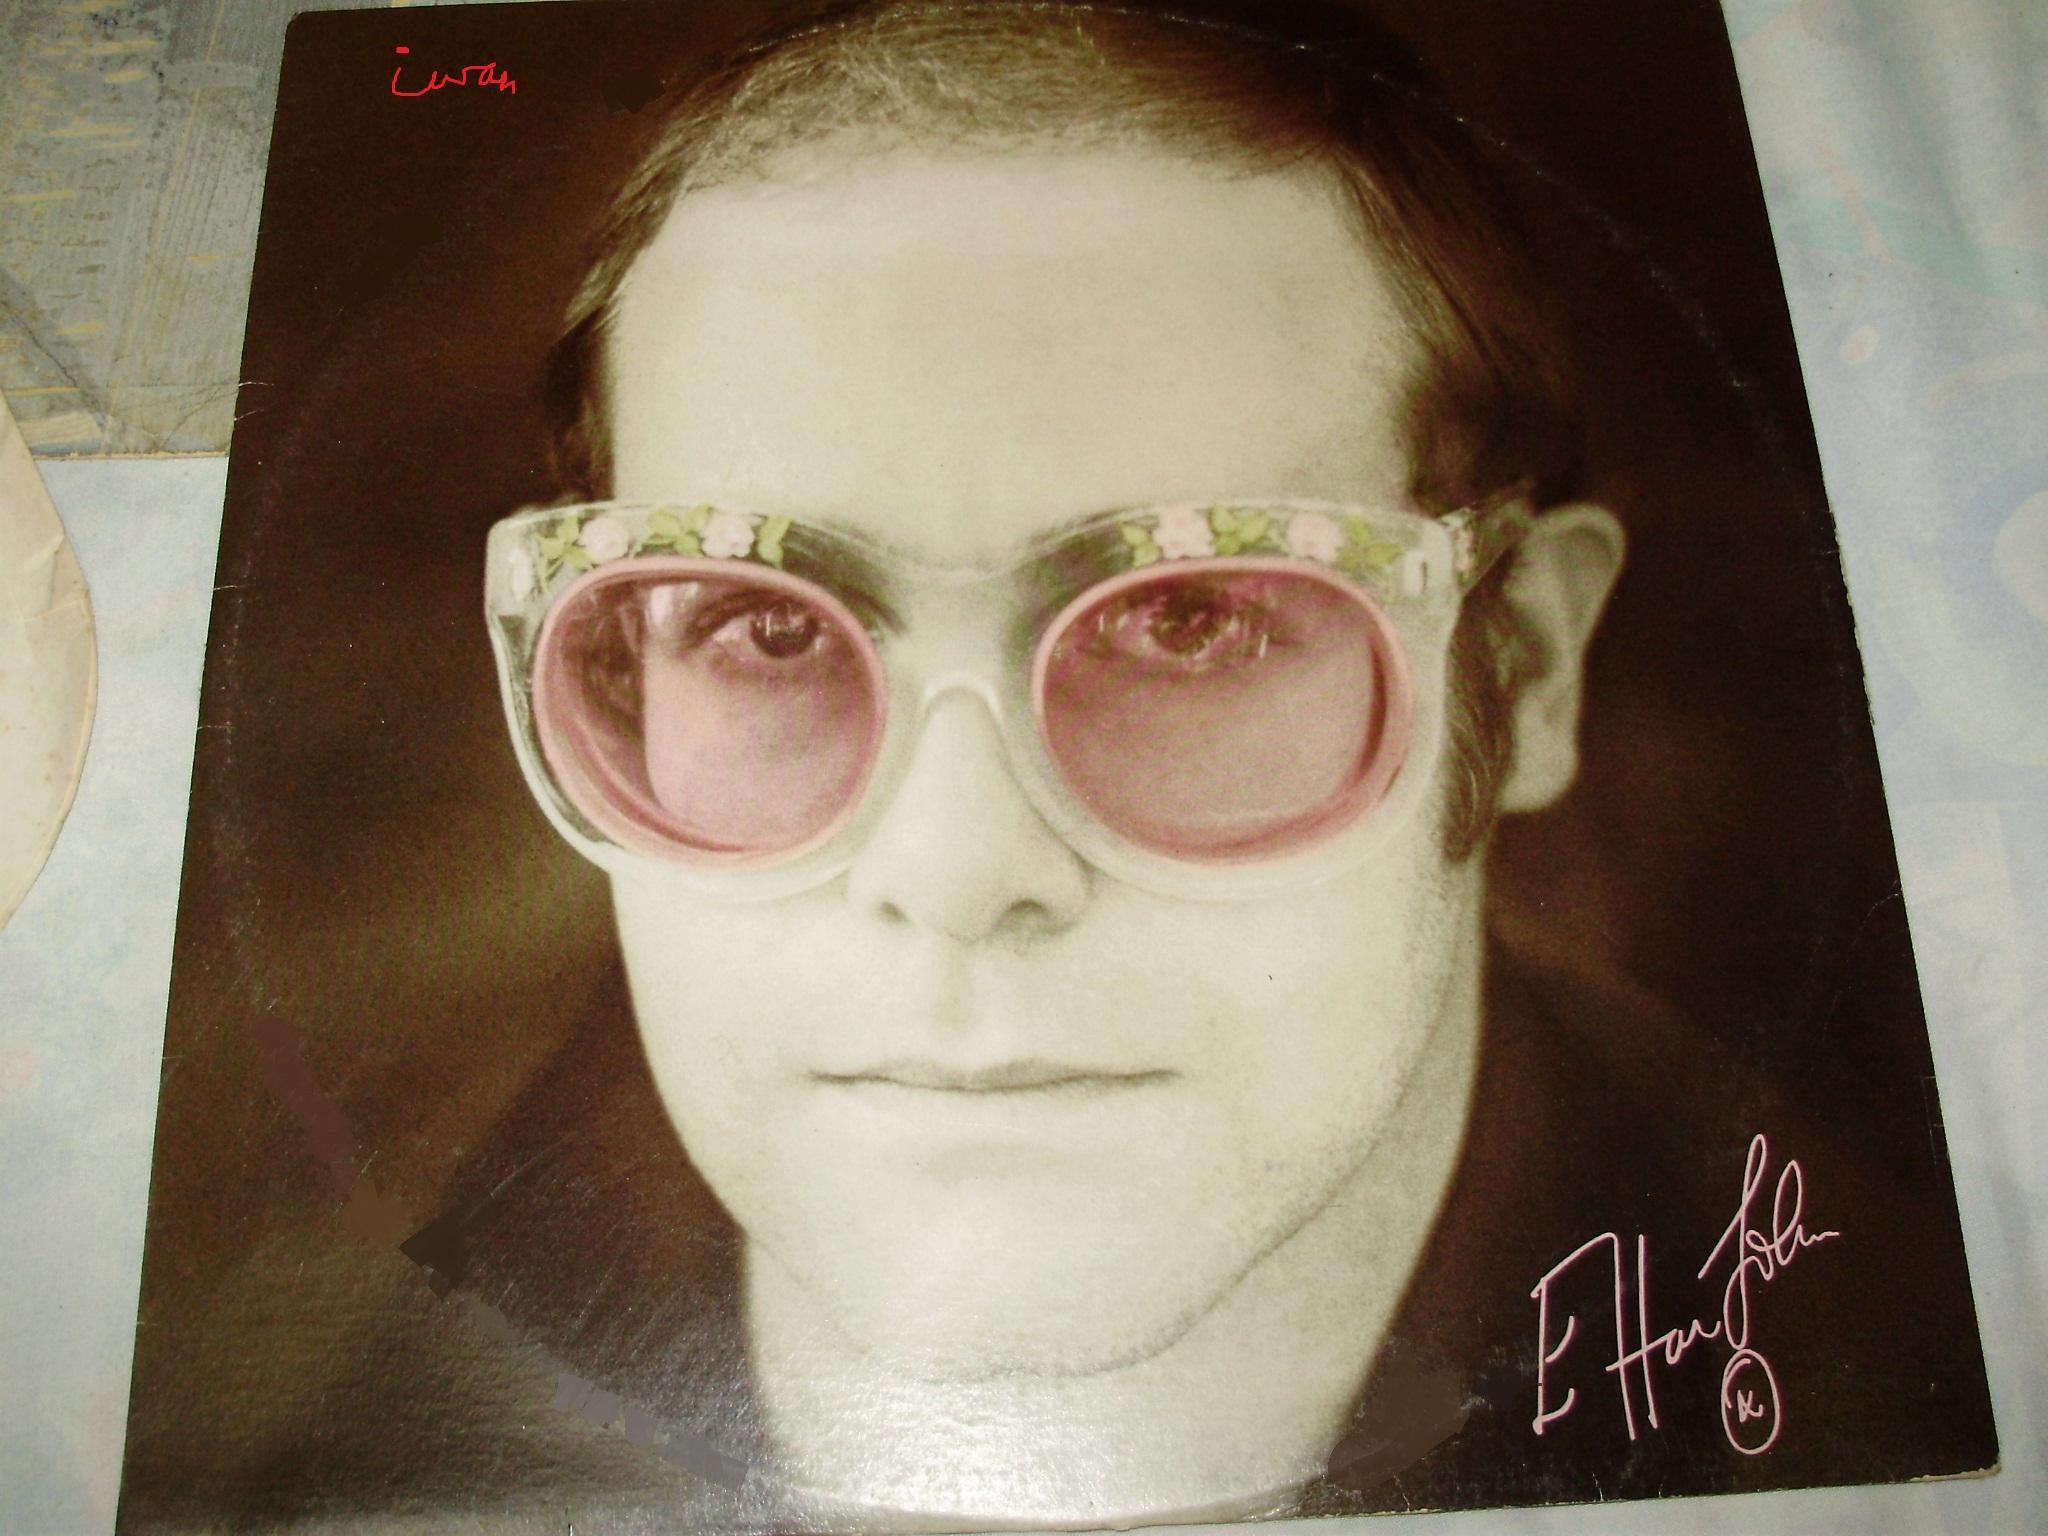 The Vintage Elton John record (piring hitam antik Elton John ...